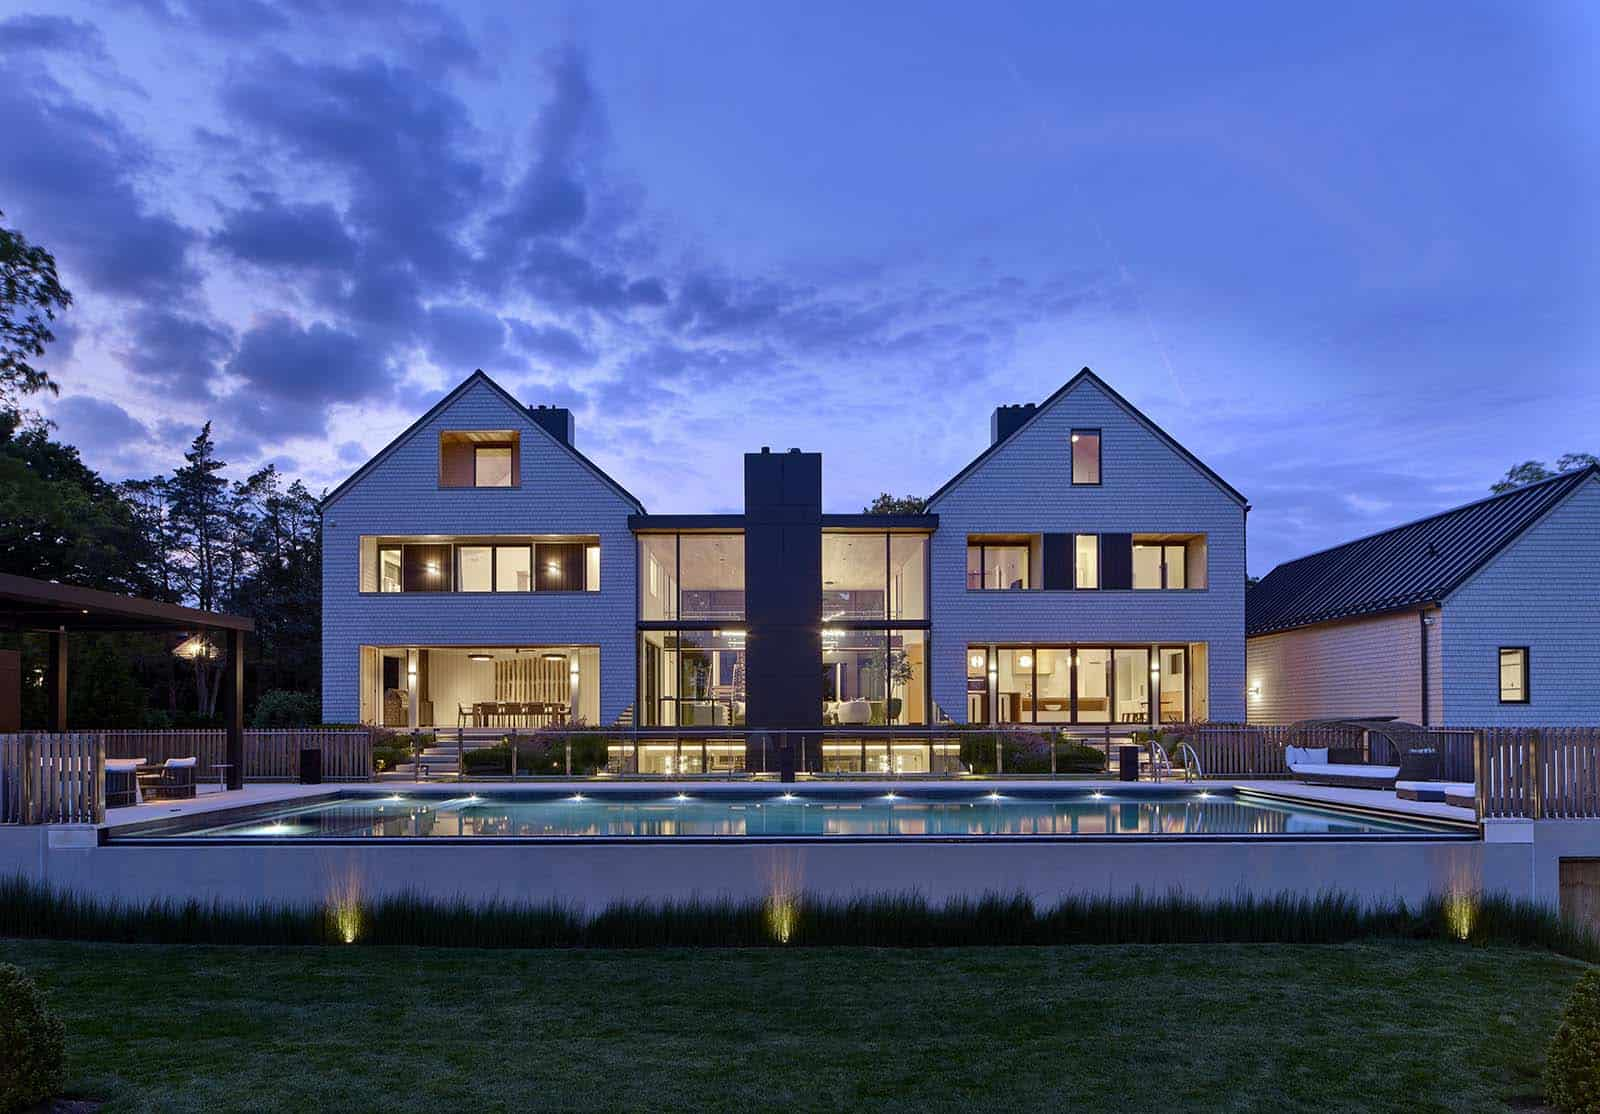 modern-home-exterior-night